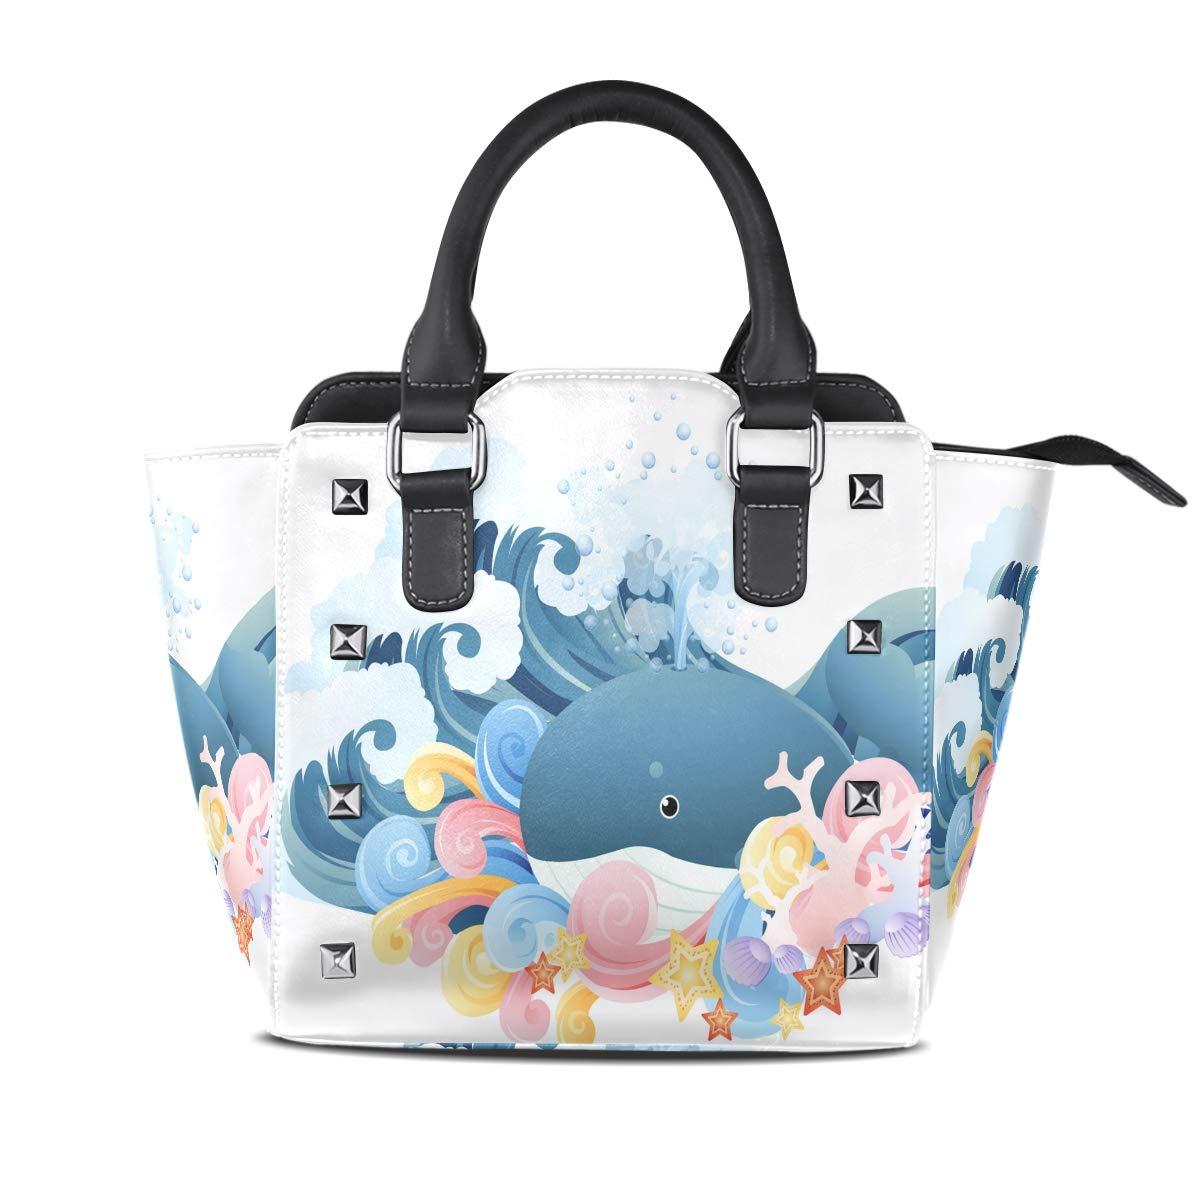 Design4 Handbag Flamingo Shell Sun Genuine Leather Tote Rivet Bag Shoulder Strap Top Handle Women